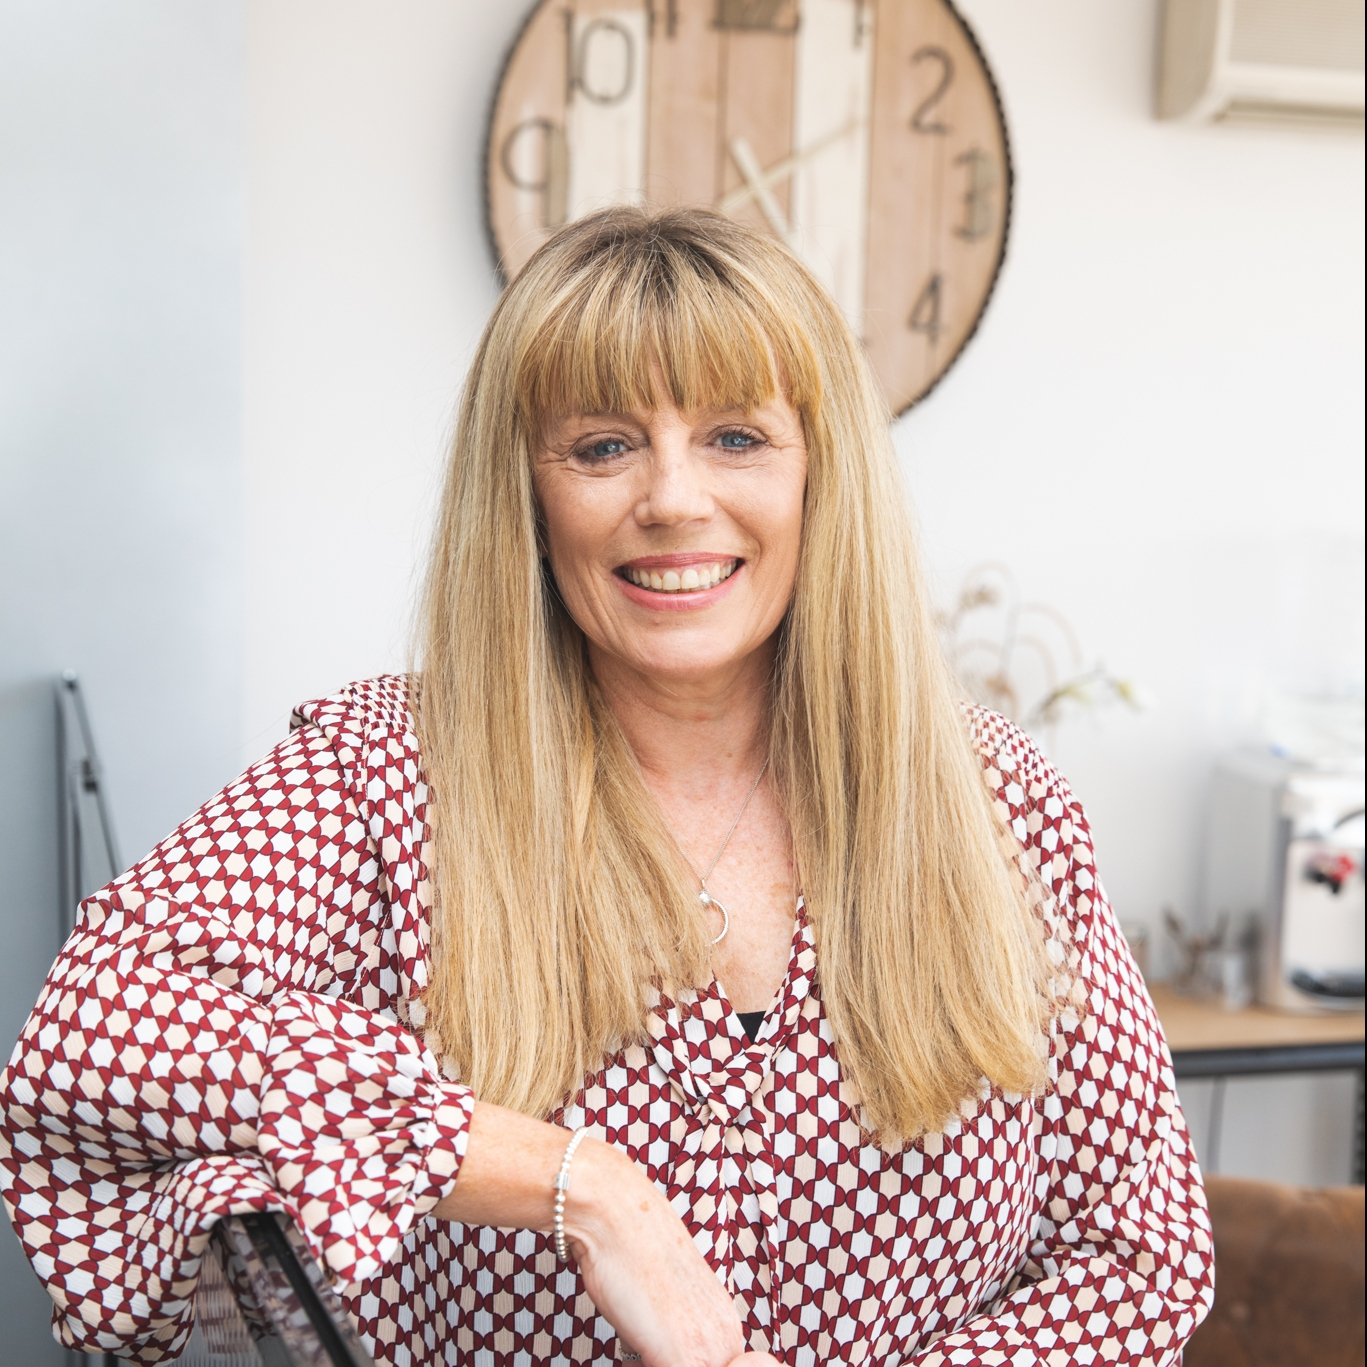 Mandy O'Sullivan